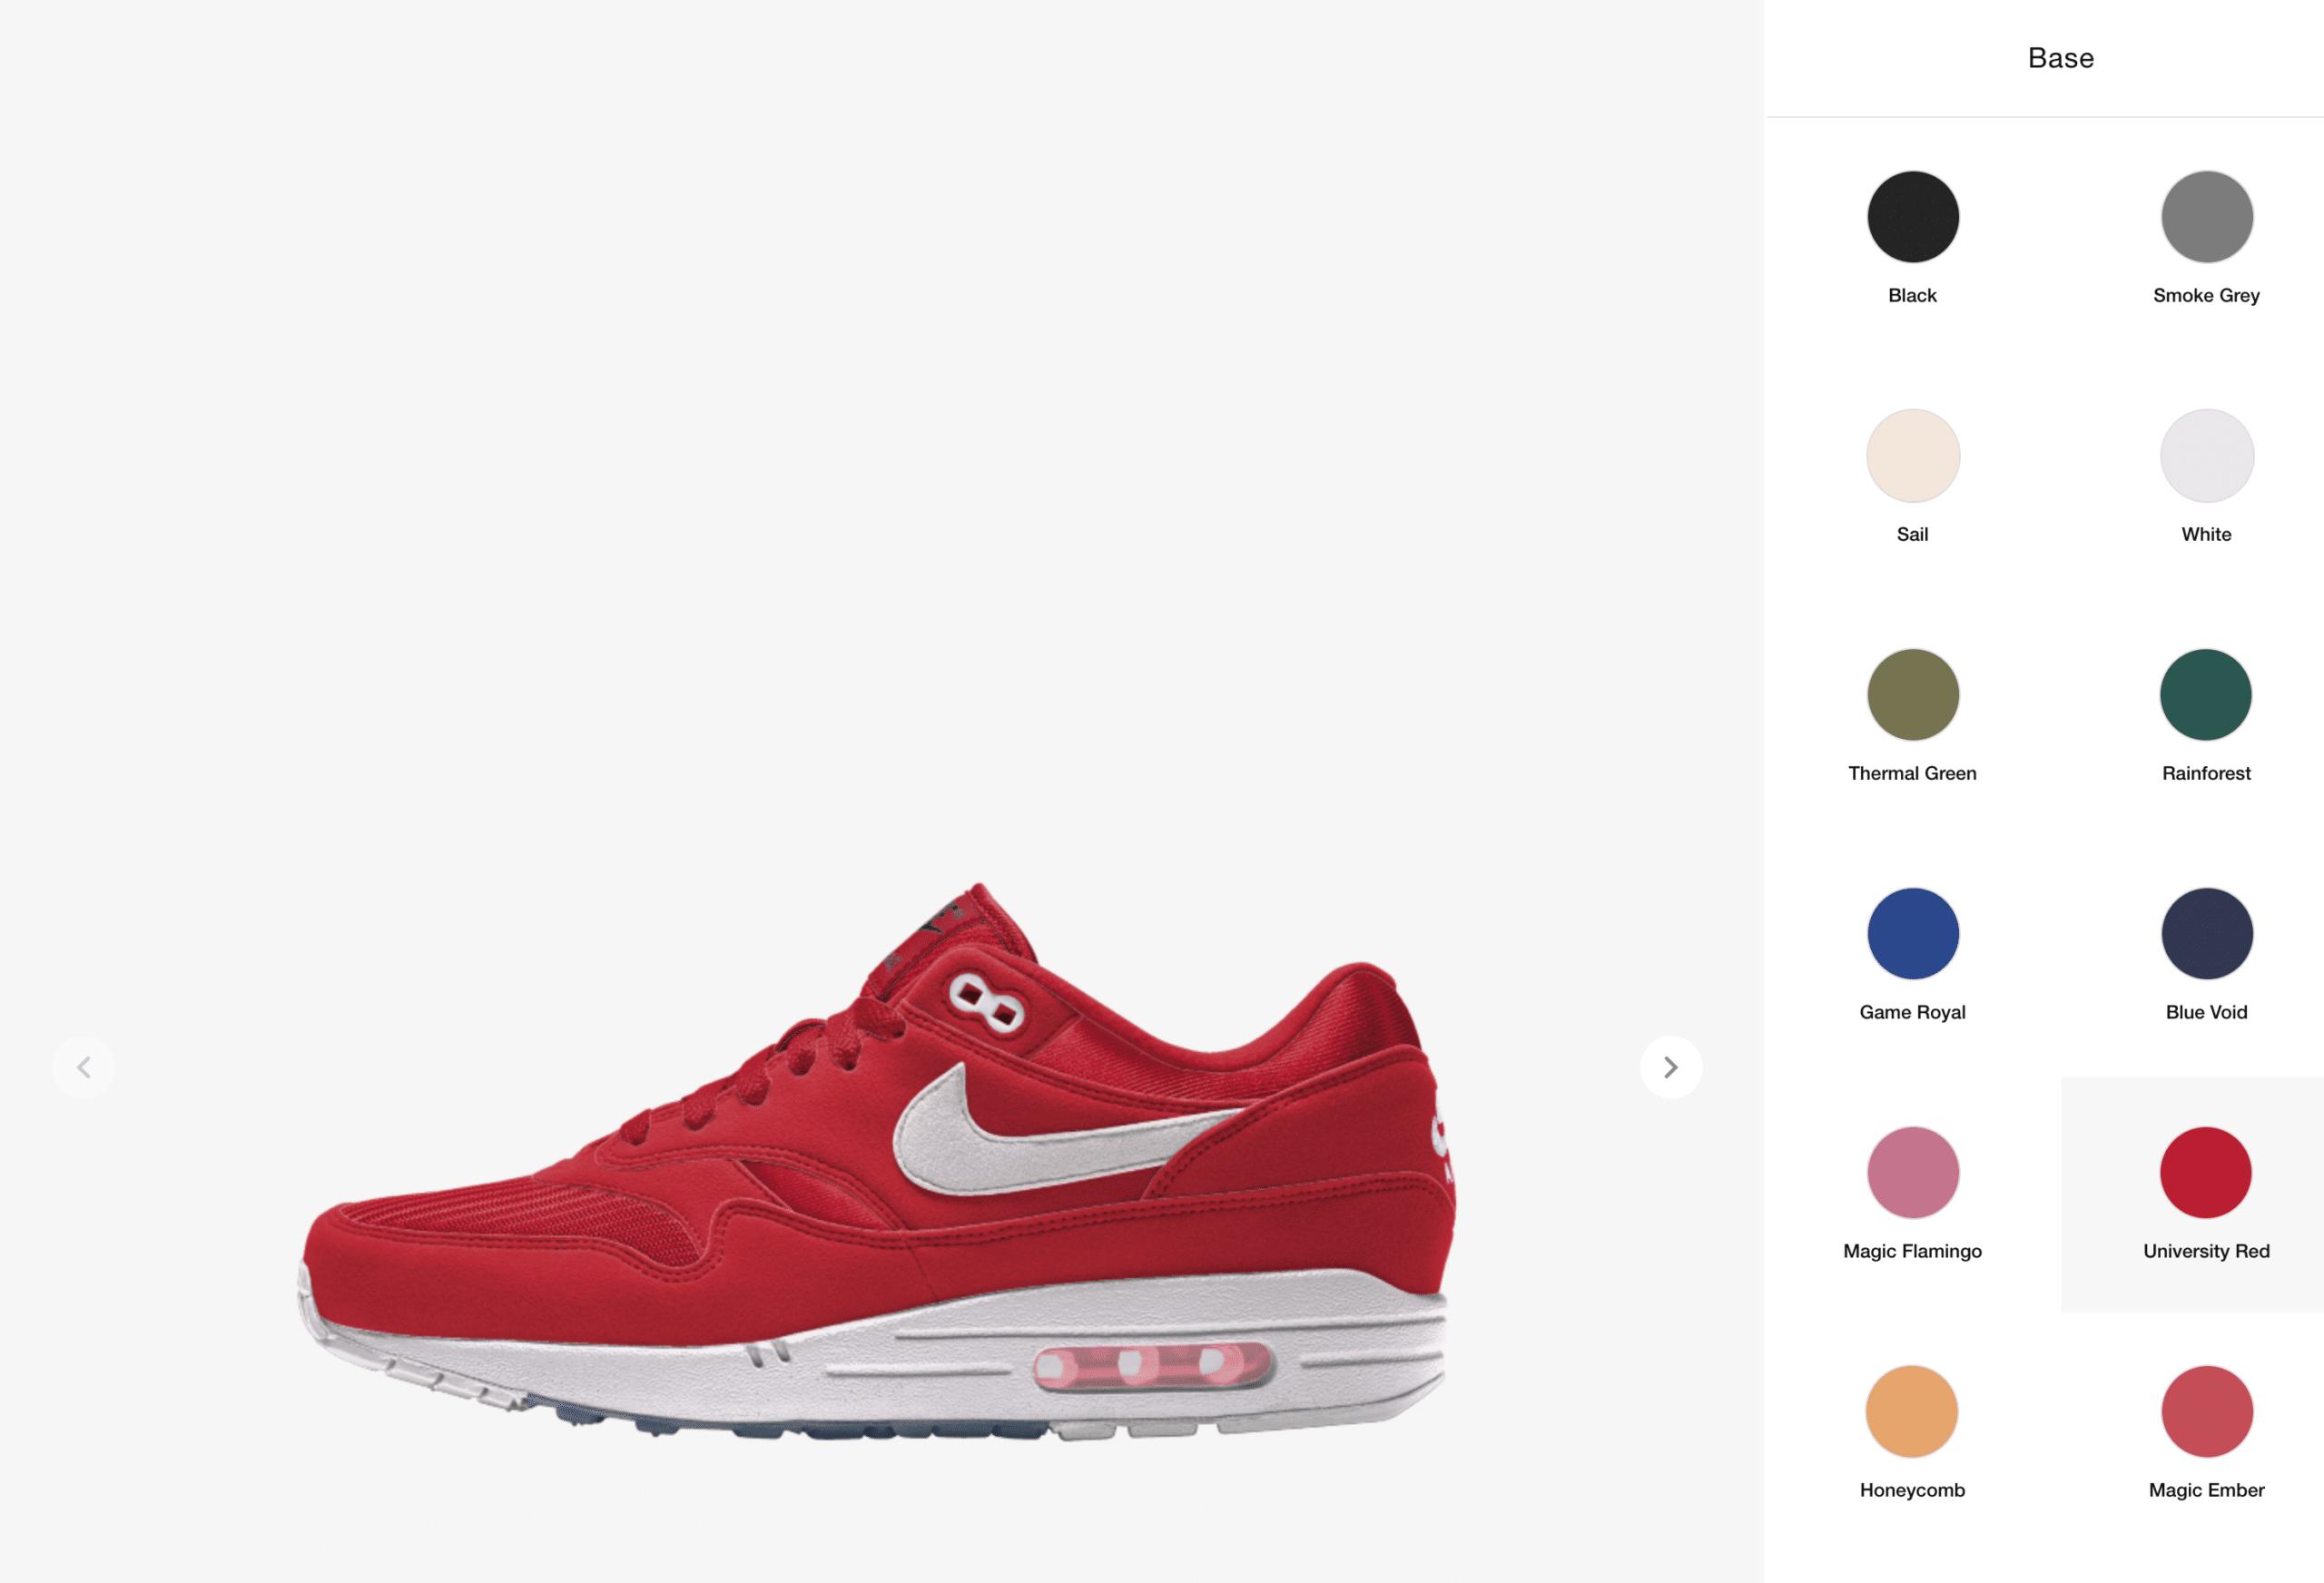 Ontwerp je eigen Nike Air Max 1 Premium NikeID